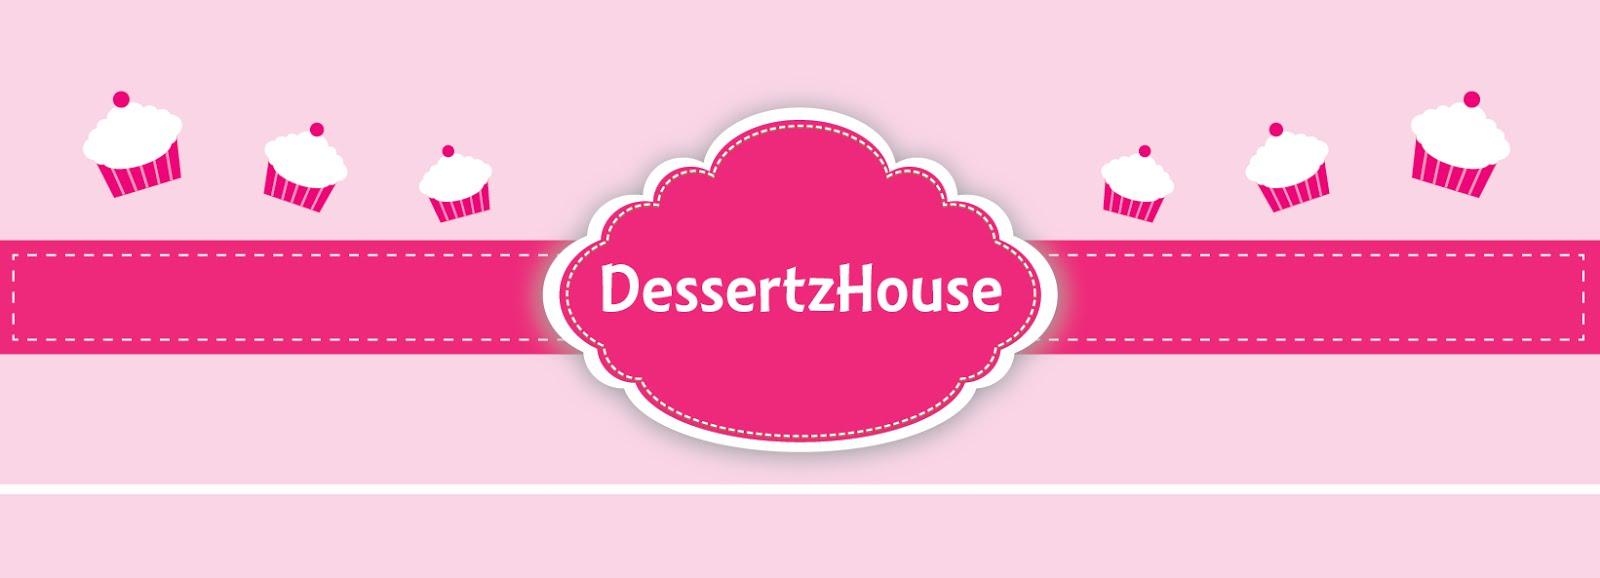 DessertzHouse